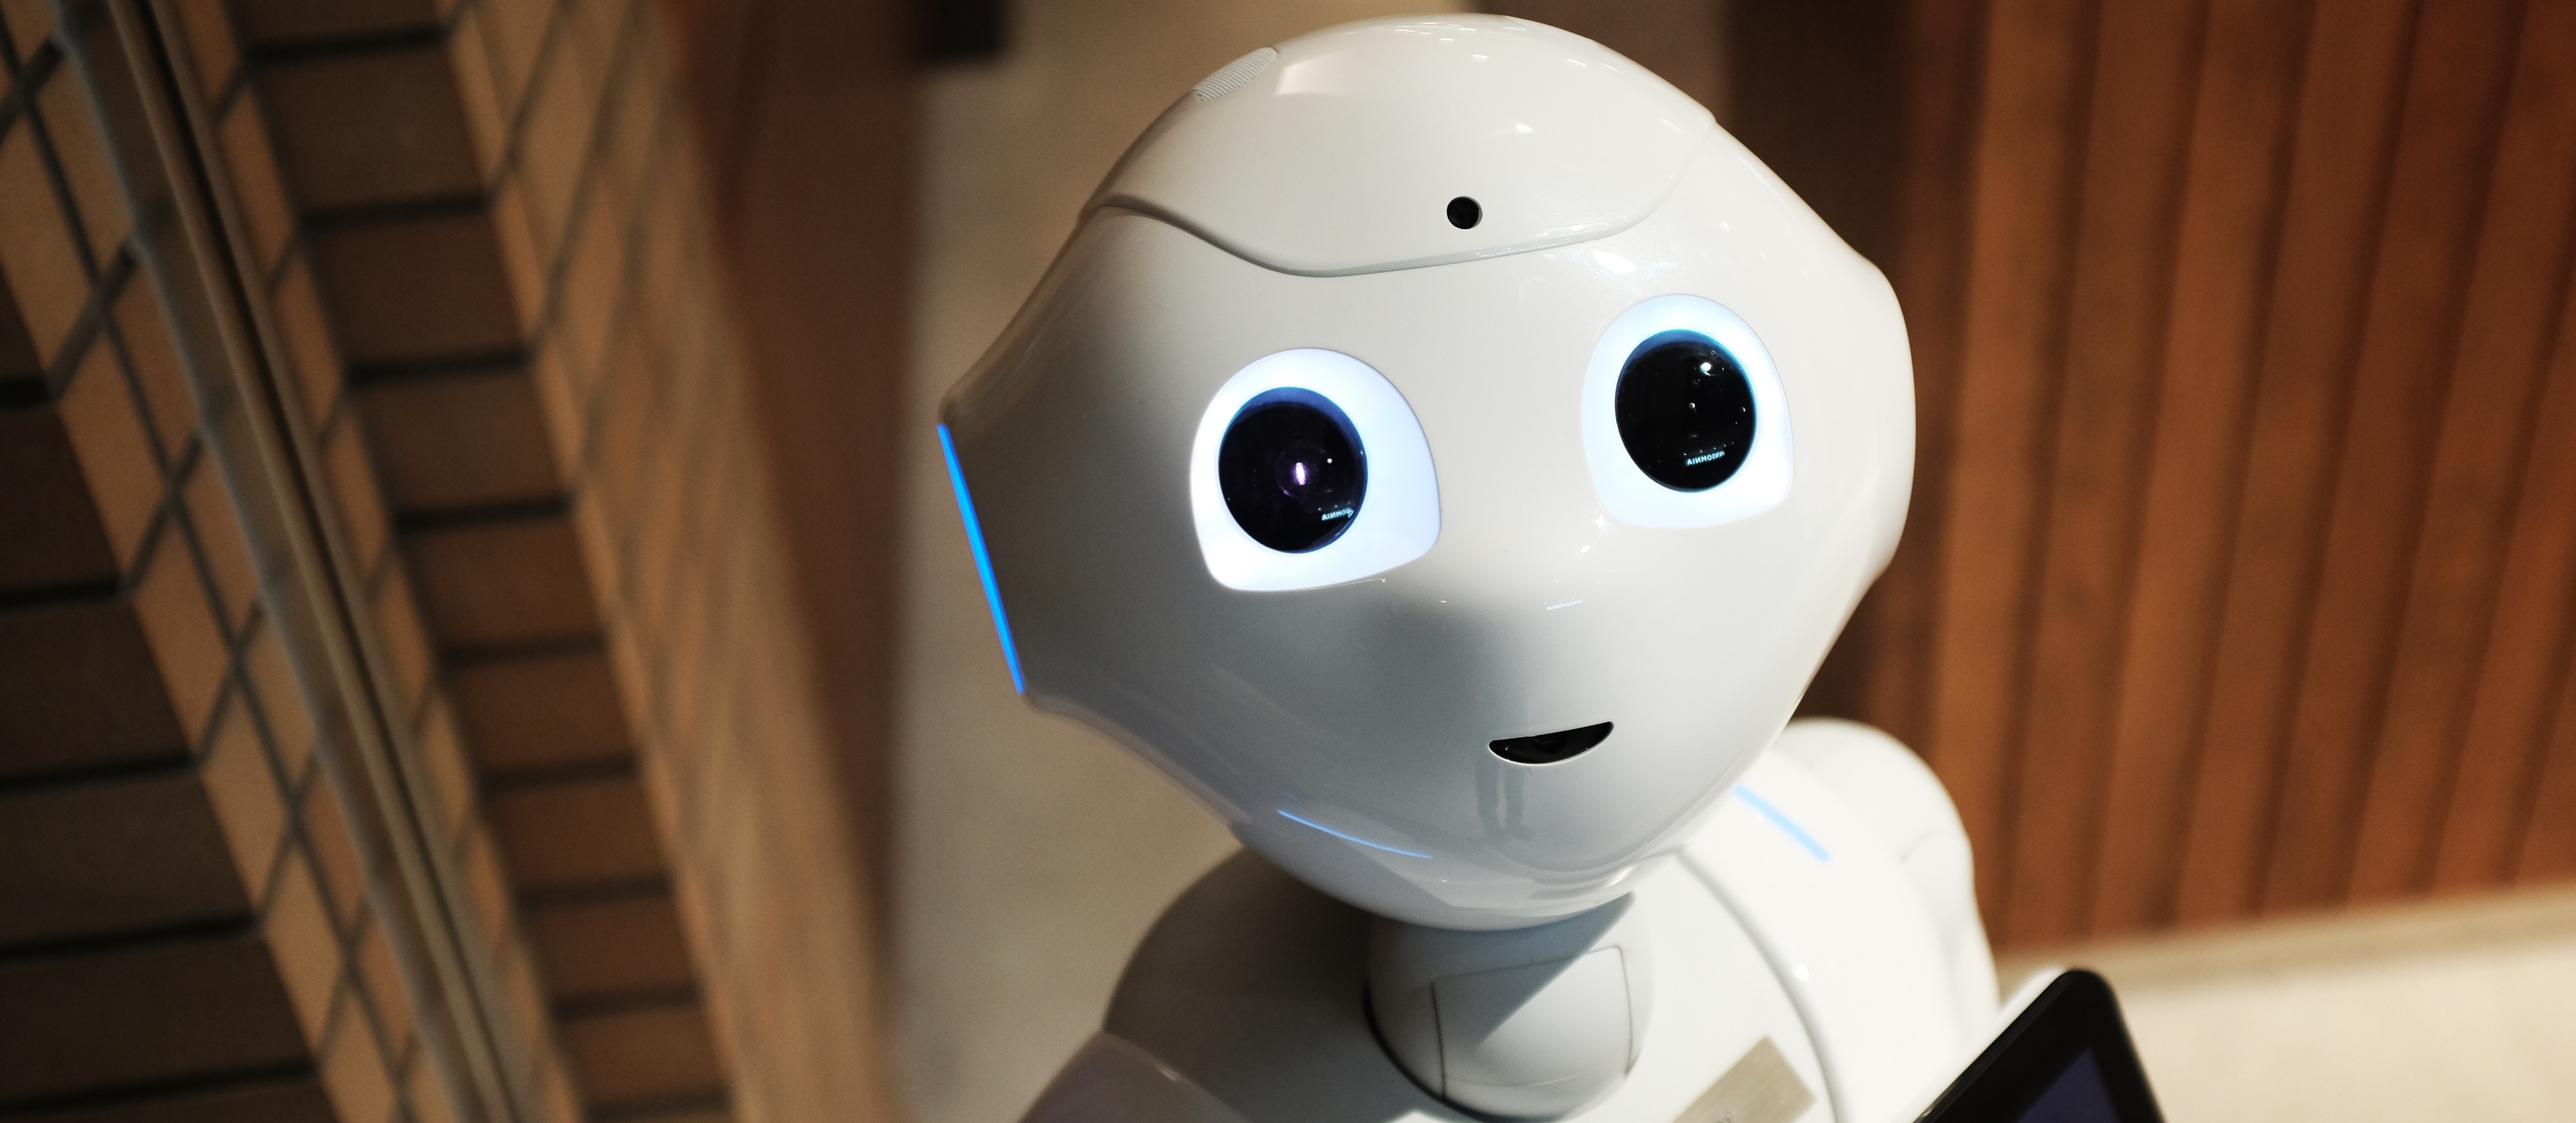 robot named pepper holding an iPad